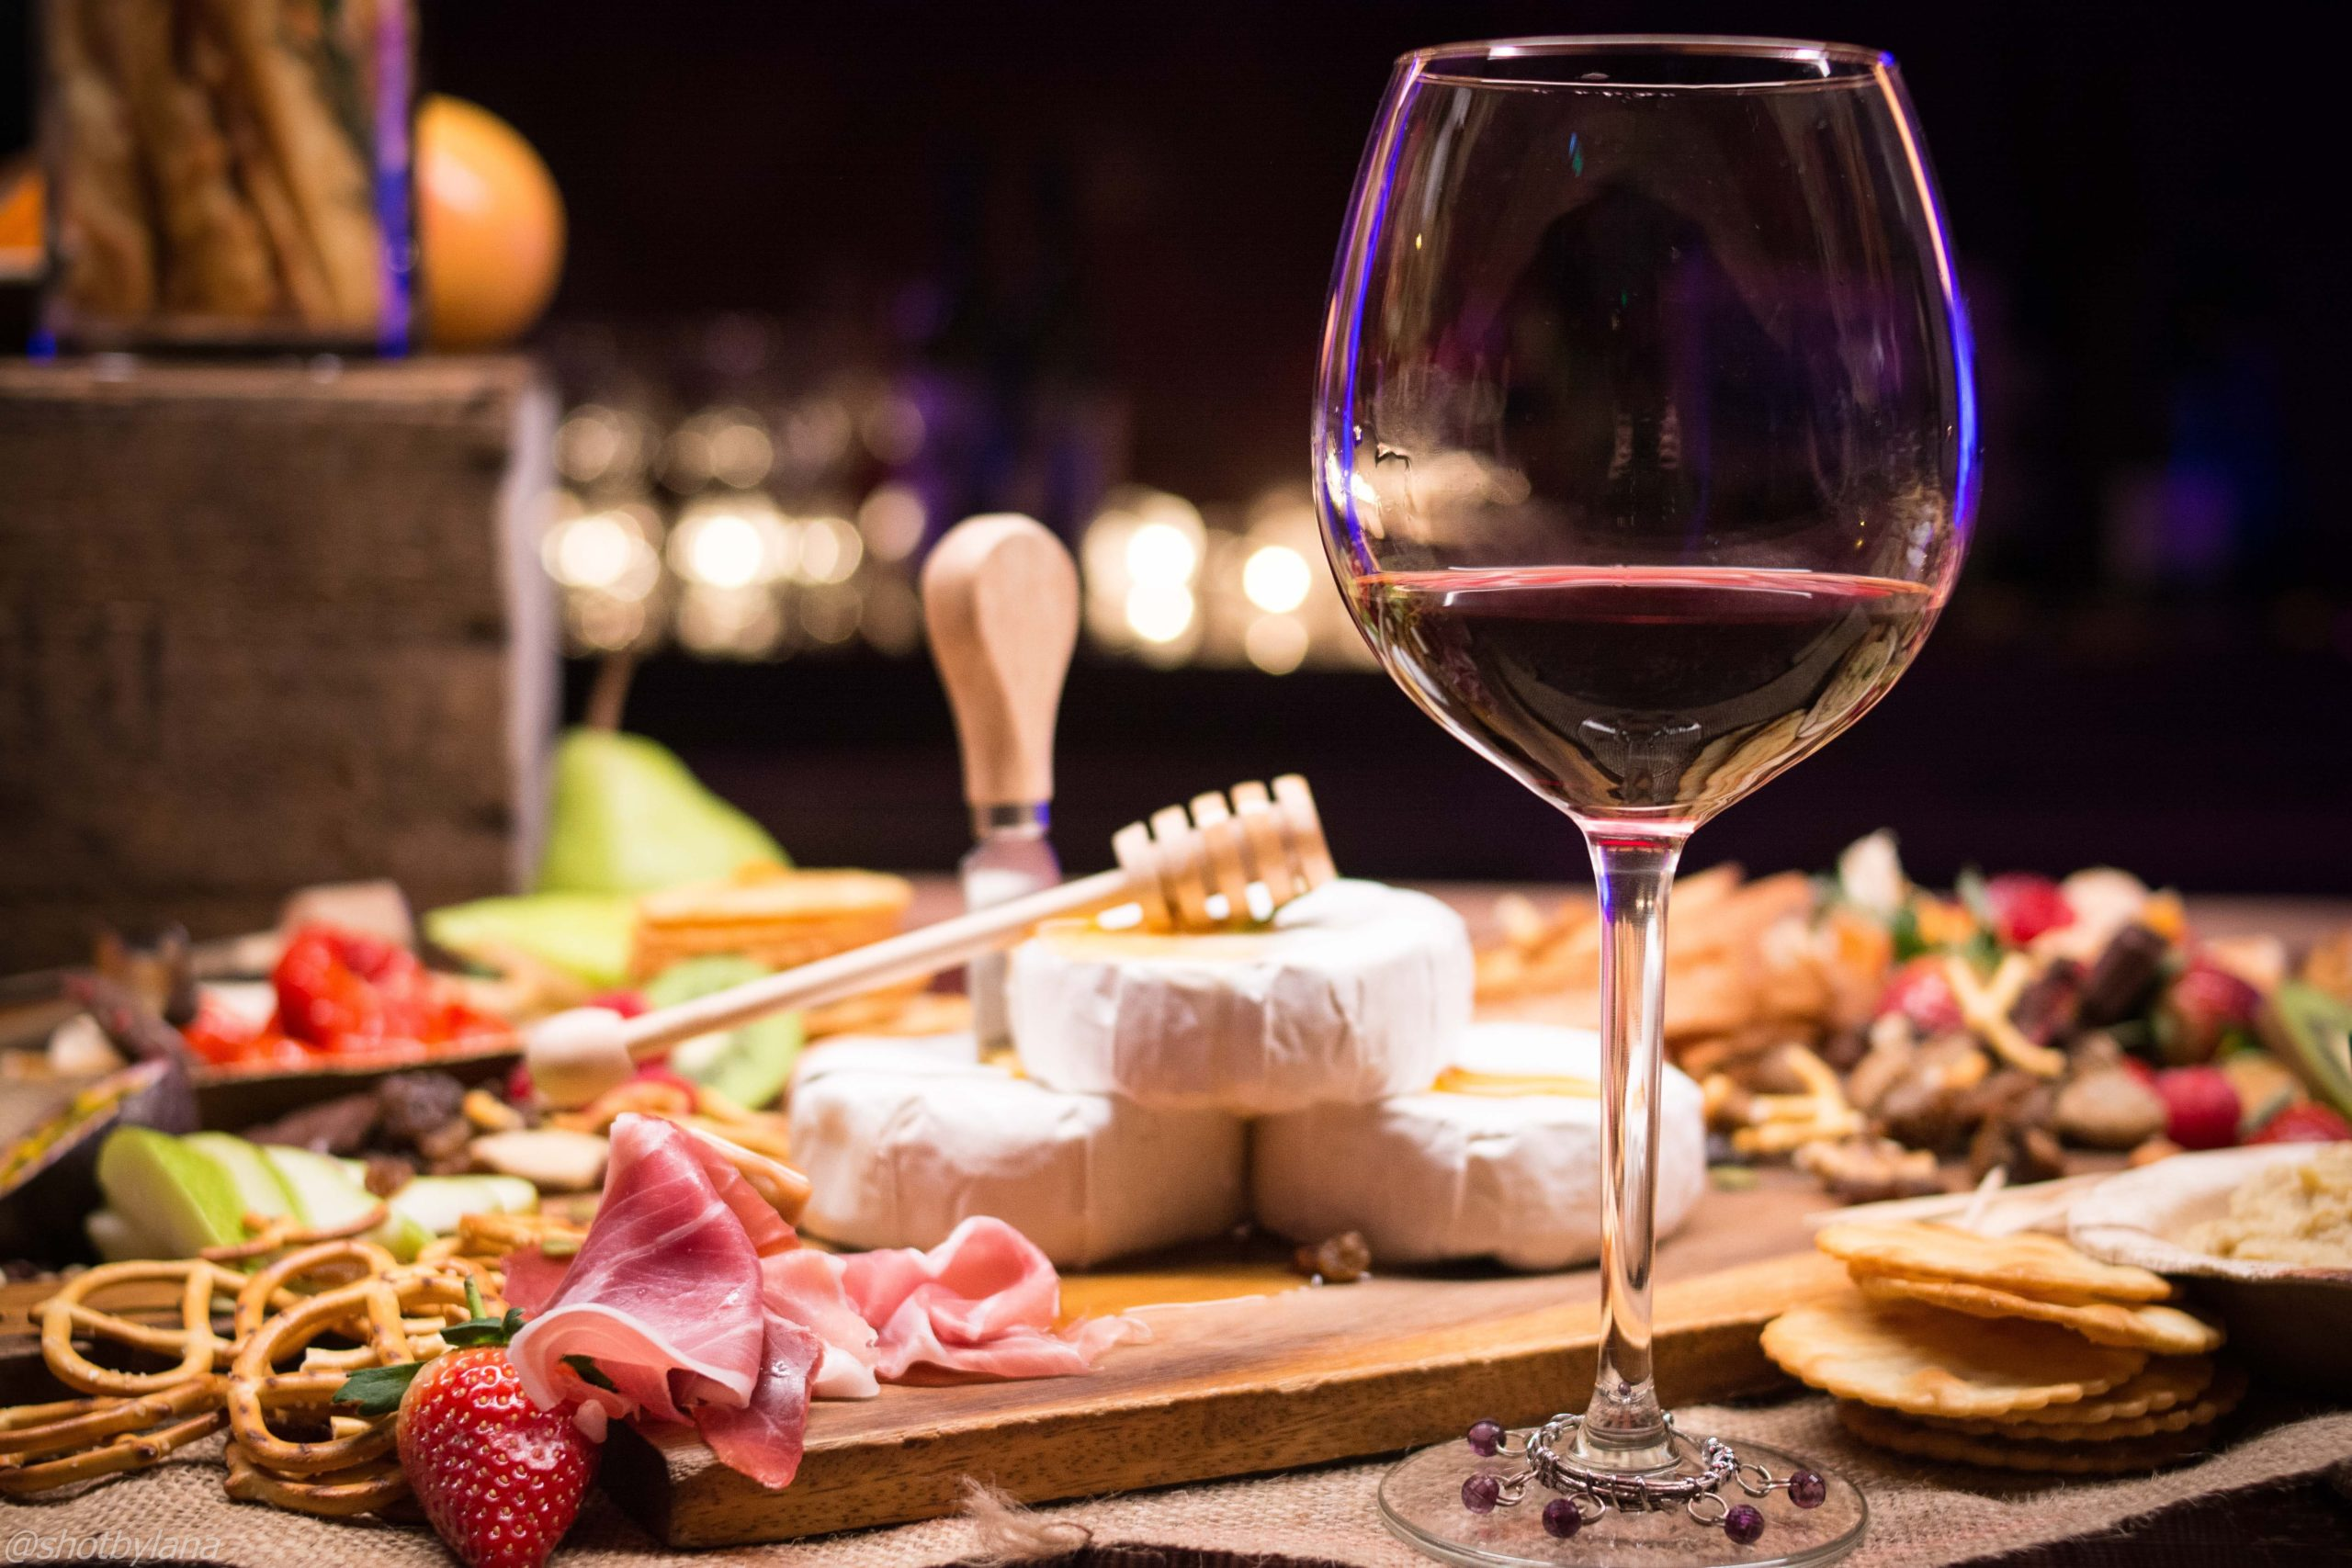 Le ricette e i vini dell'Etna